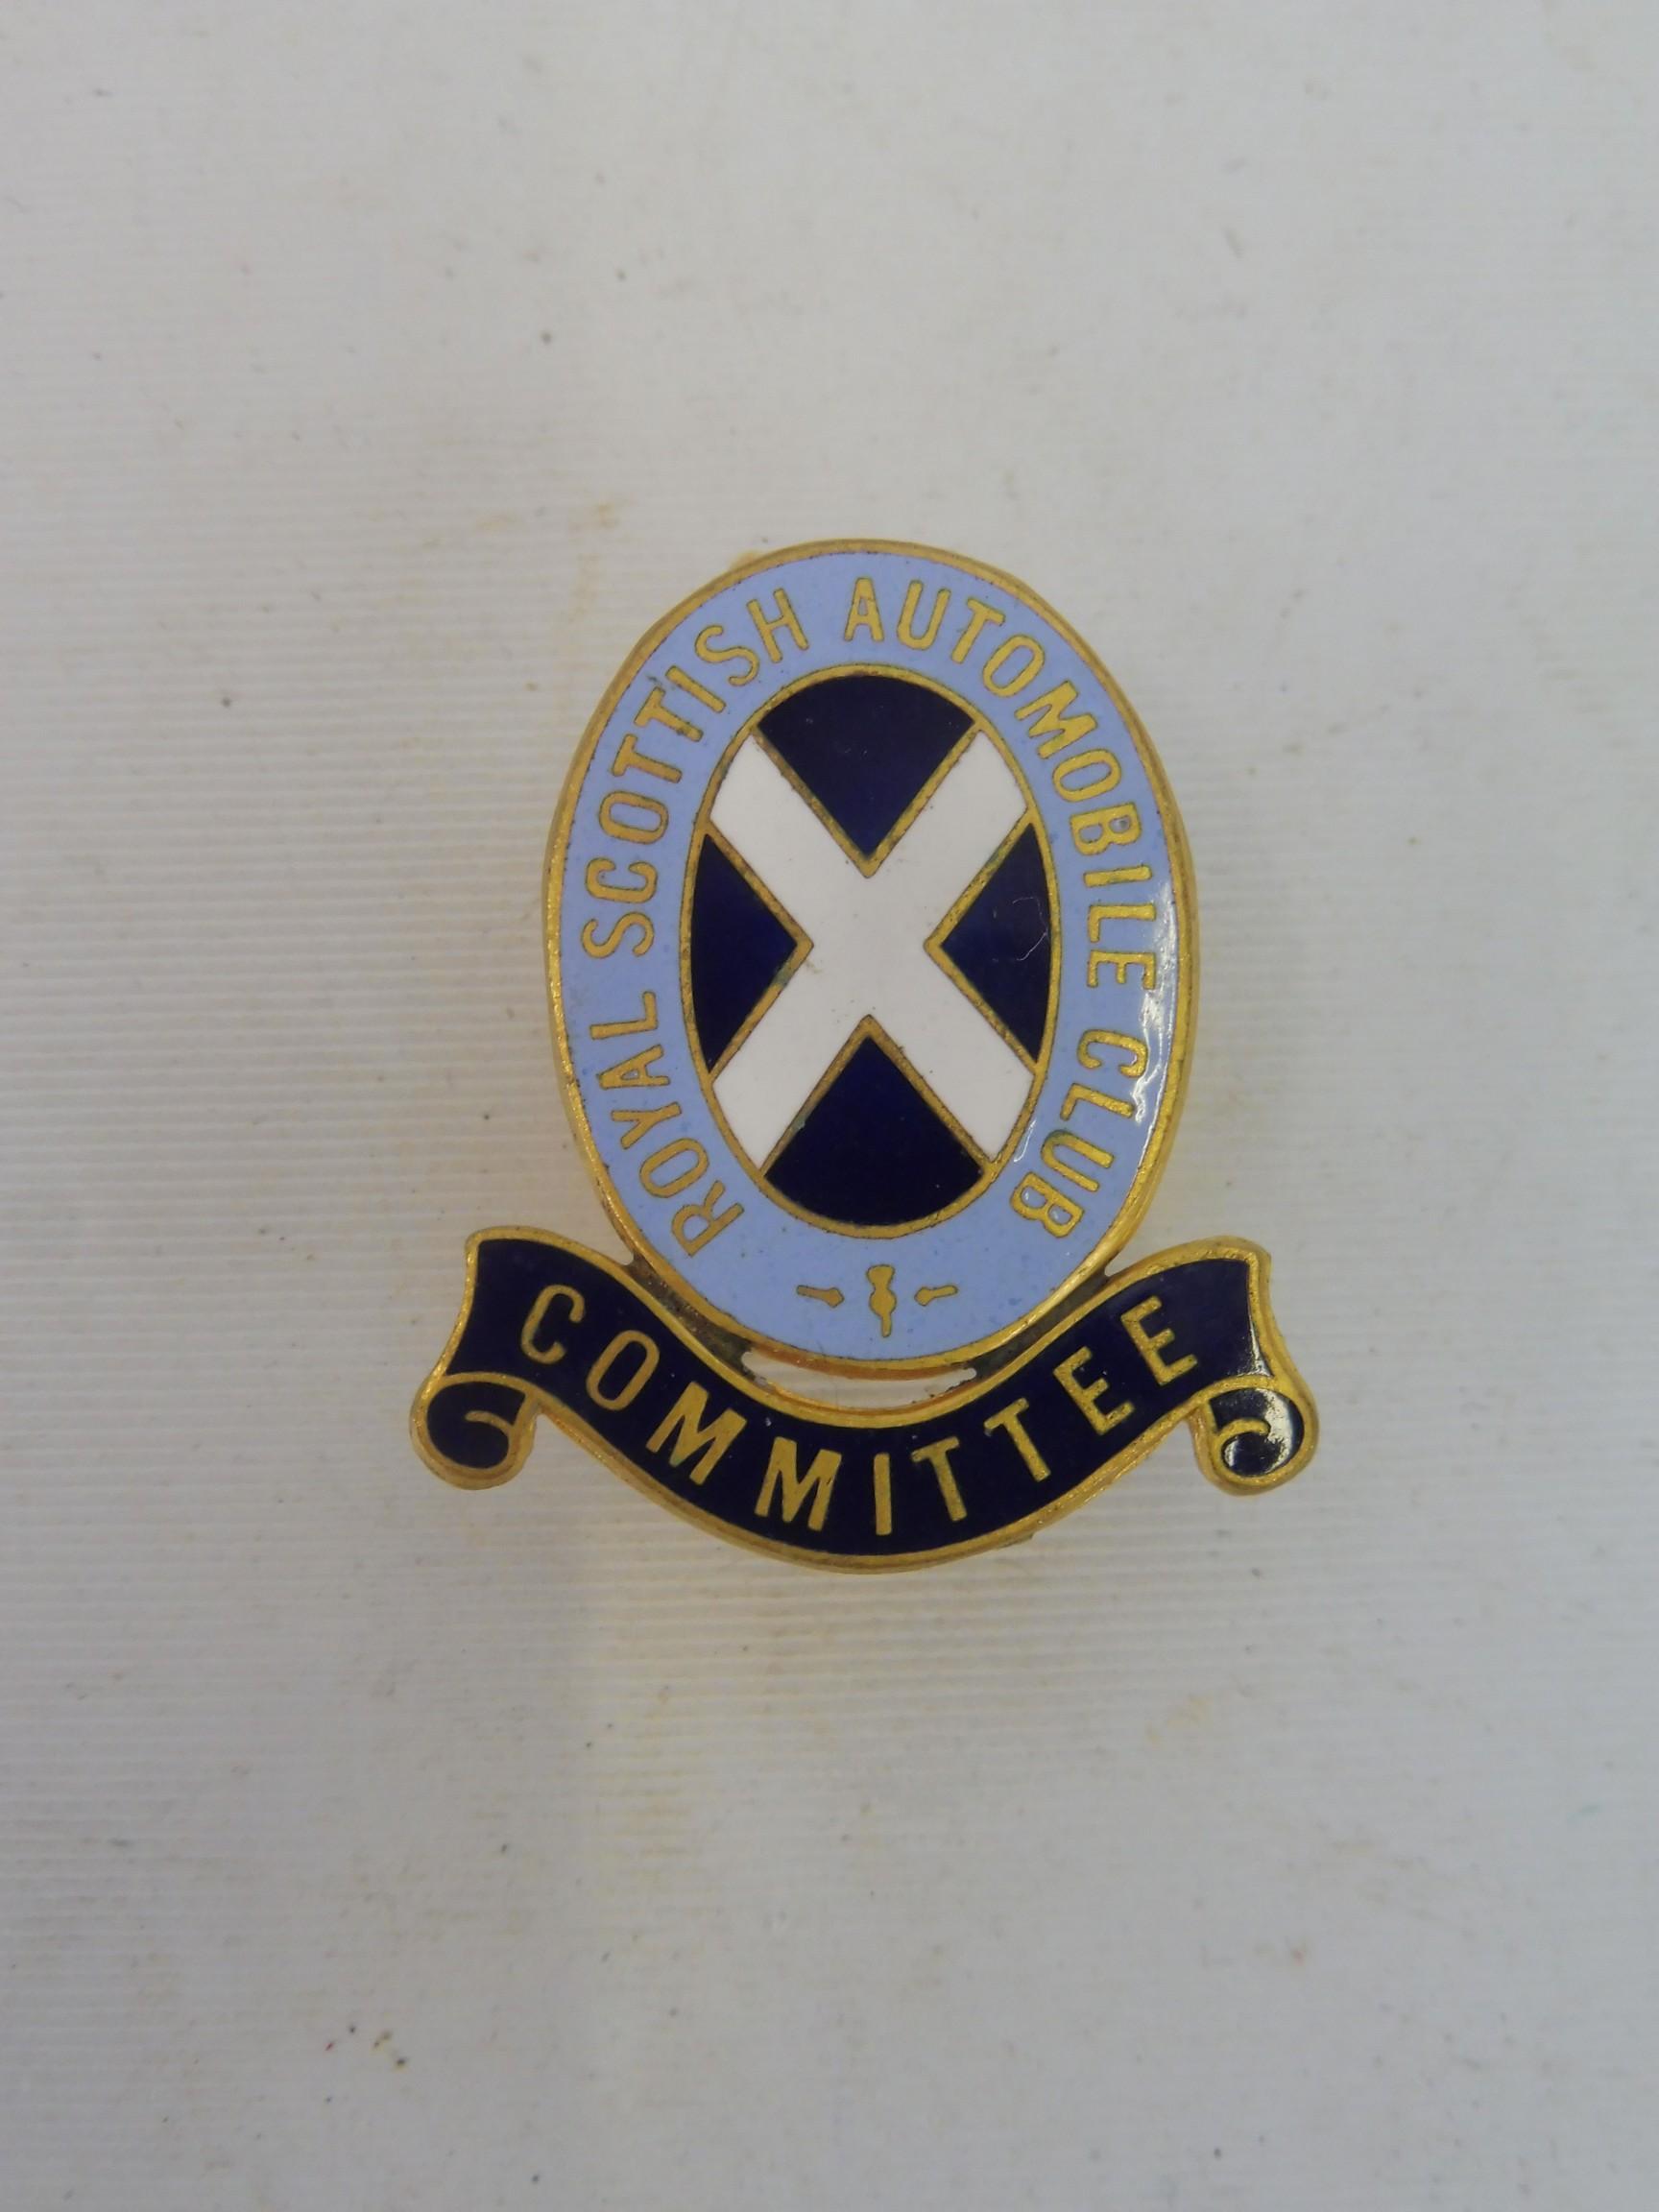 A Royal Scottish Automobile Club 'Committee' enamel lapel badge.